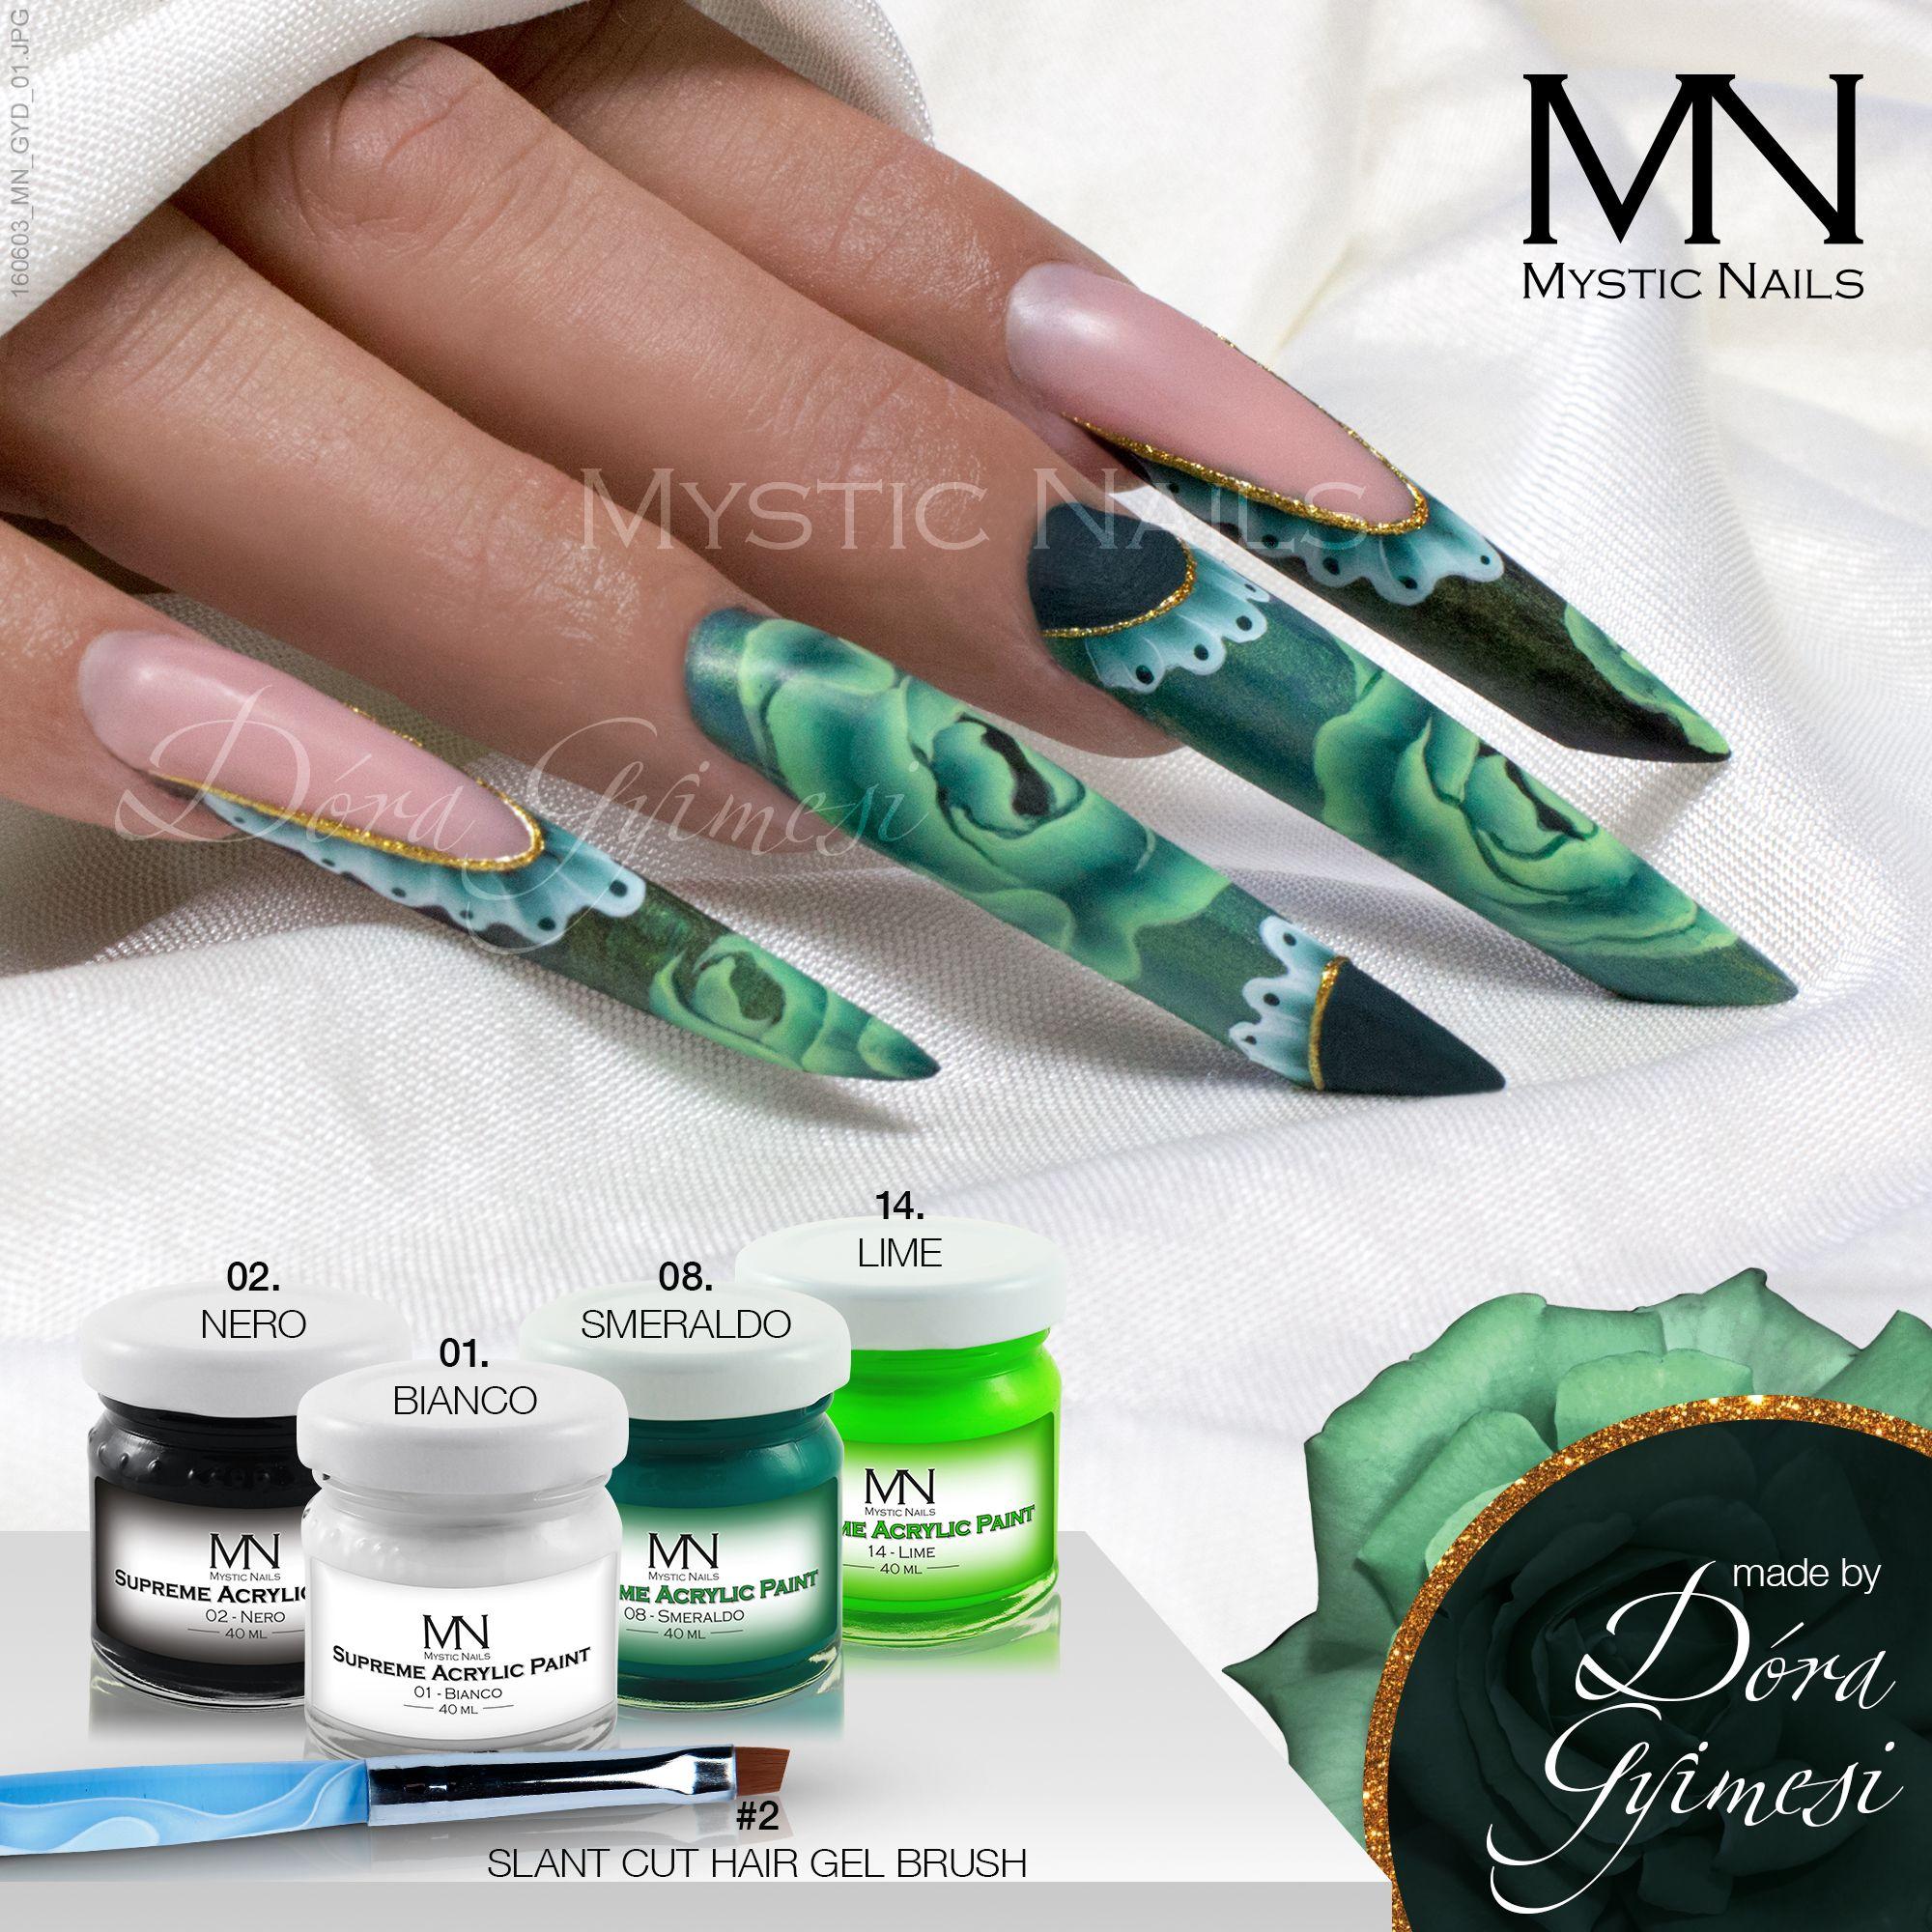 160603_MN_GYD_01 nail art salon nails nail art gel one stroke nail ...